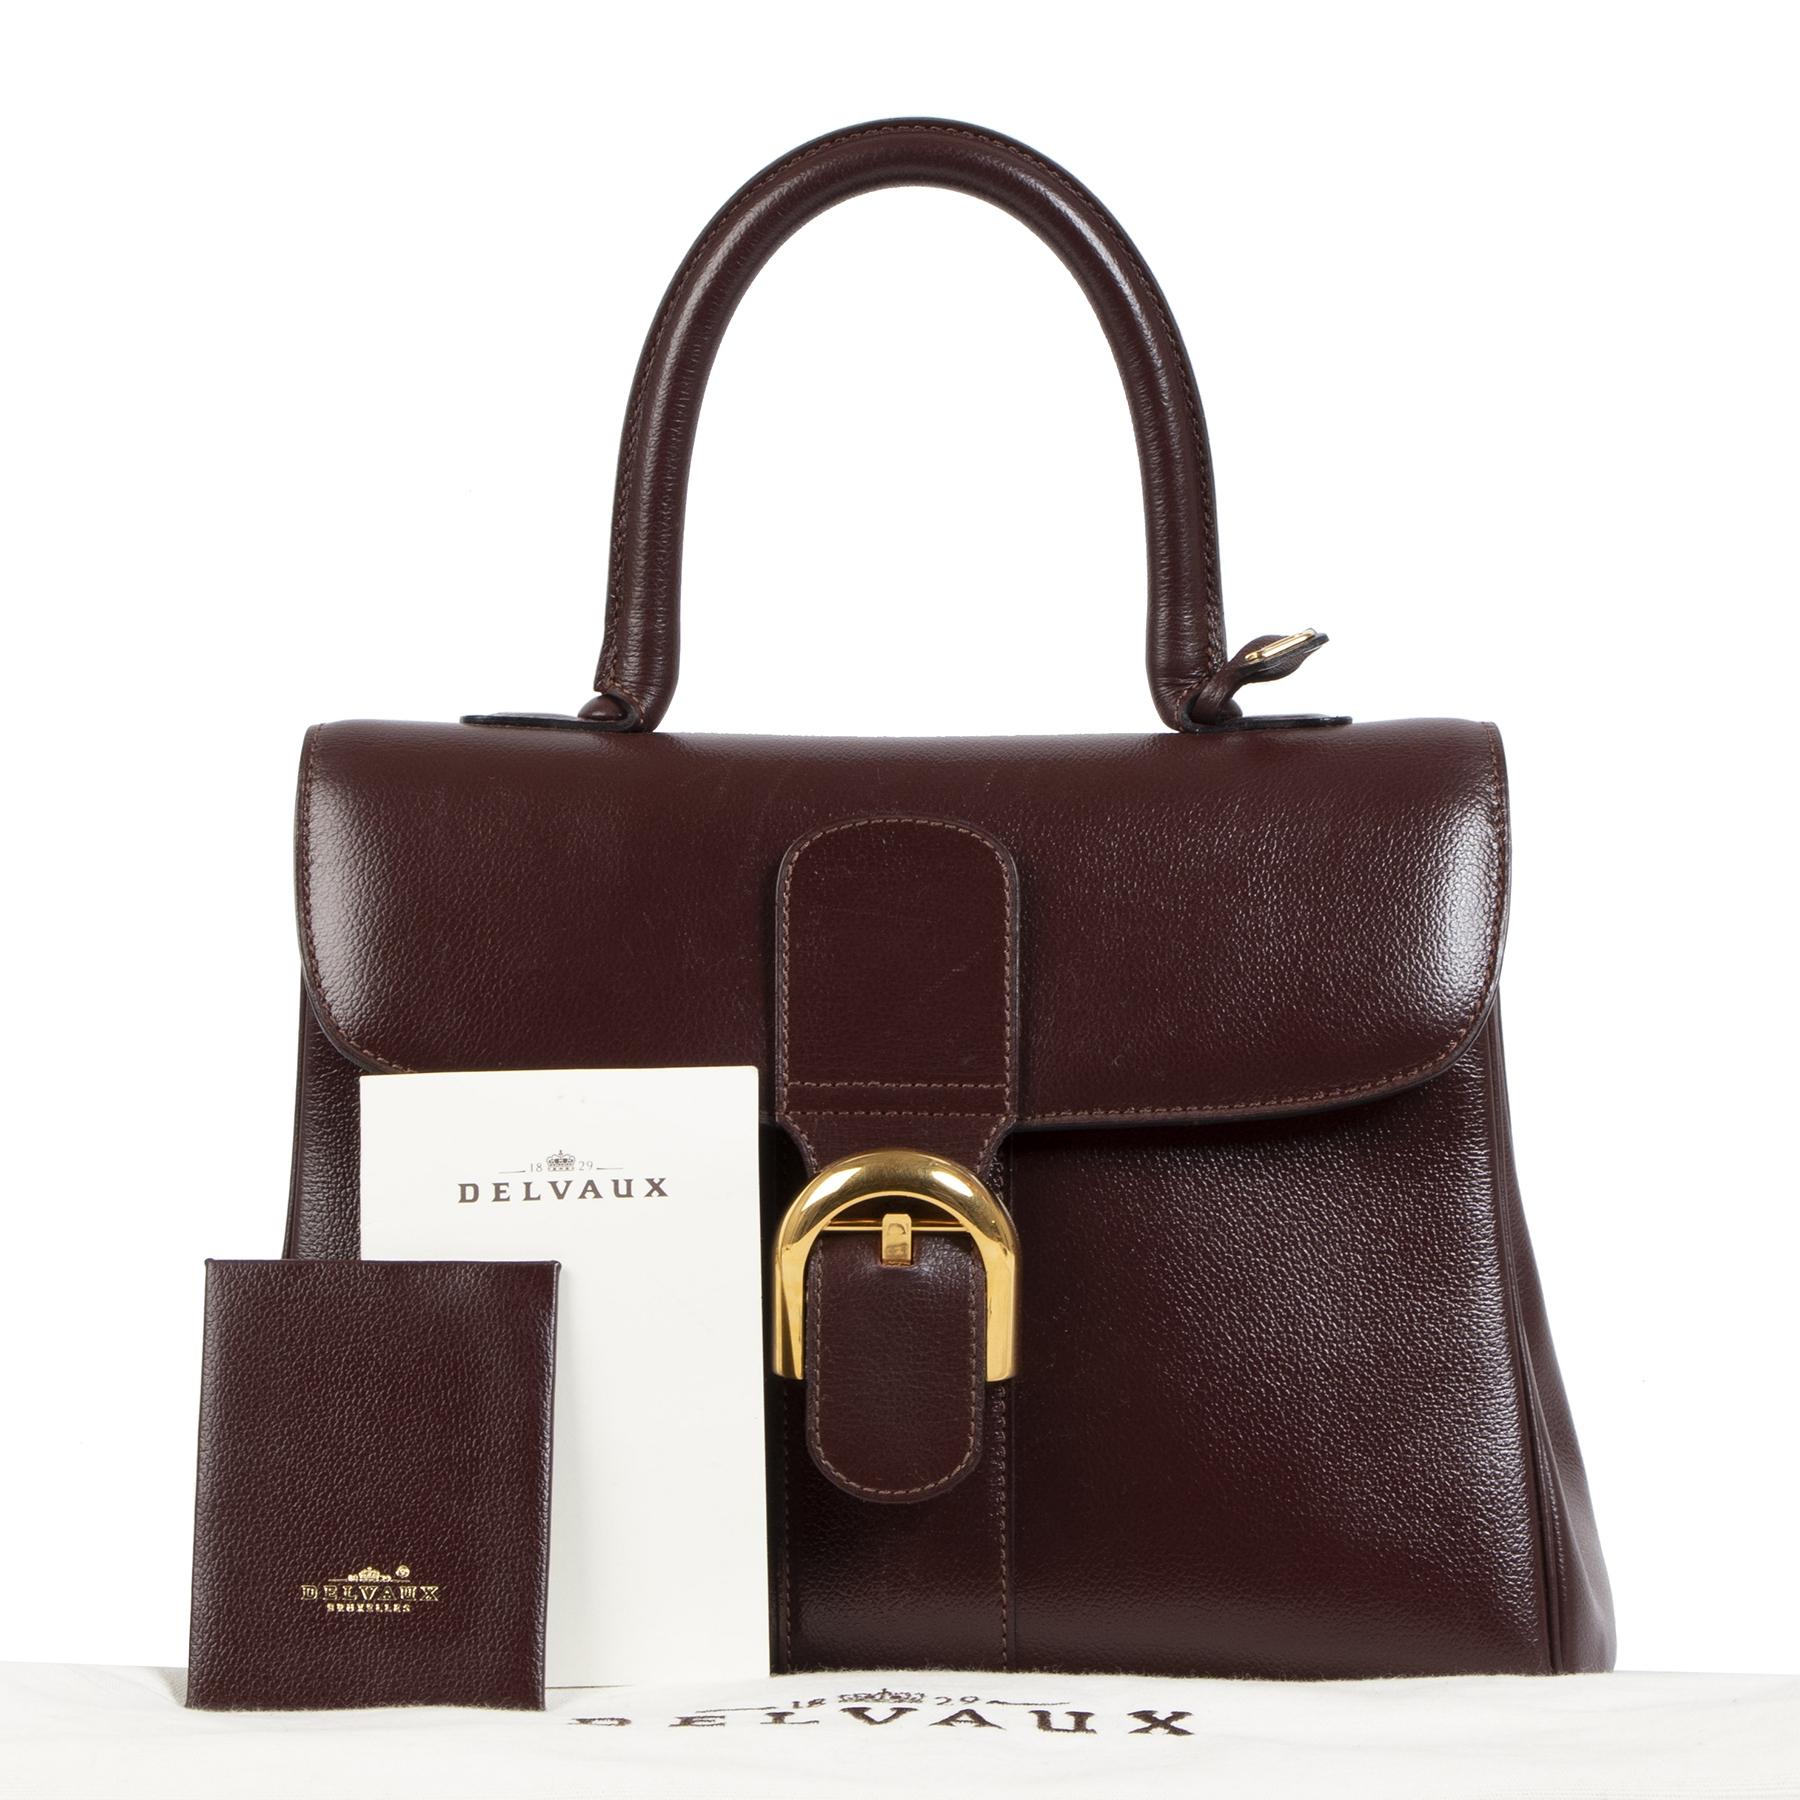 Authentieke tweedehands vintage Delvaux Burgundy Brown Brillant MM Bag koop online webshop LabelLOV